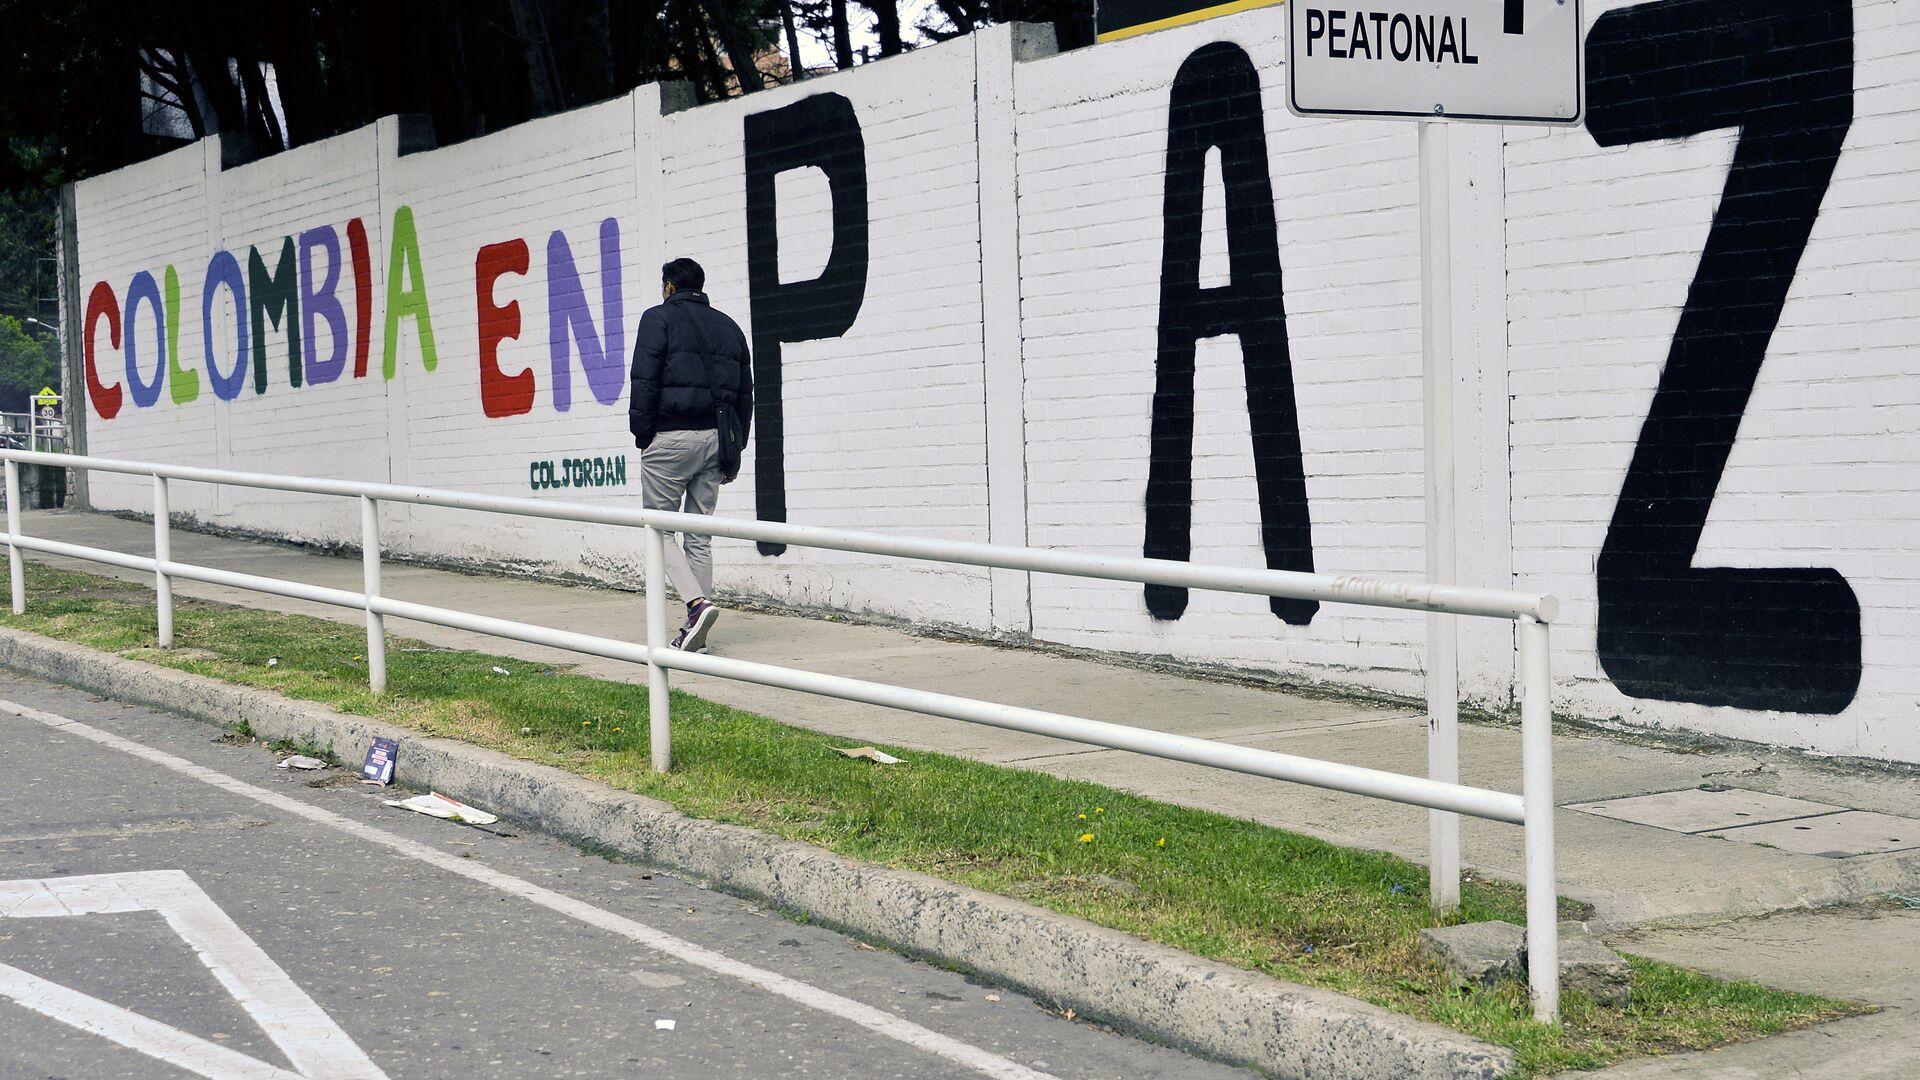 Un graffiti con una frase que dice Colombia en paz - Sputnik Mundo, 1920, 04.10.2021